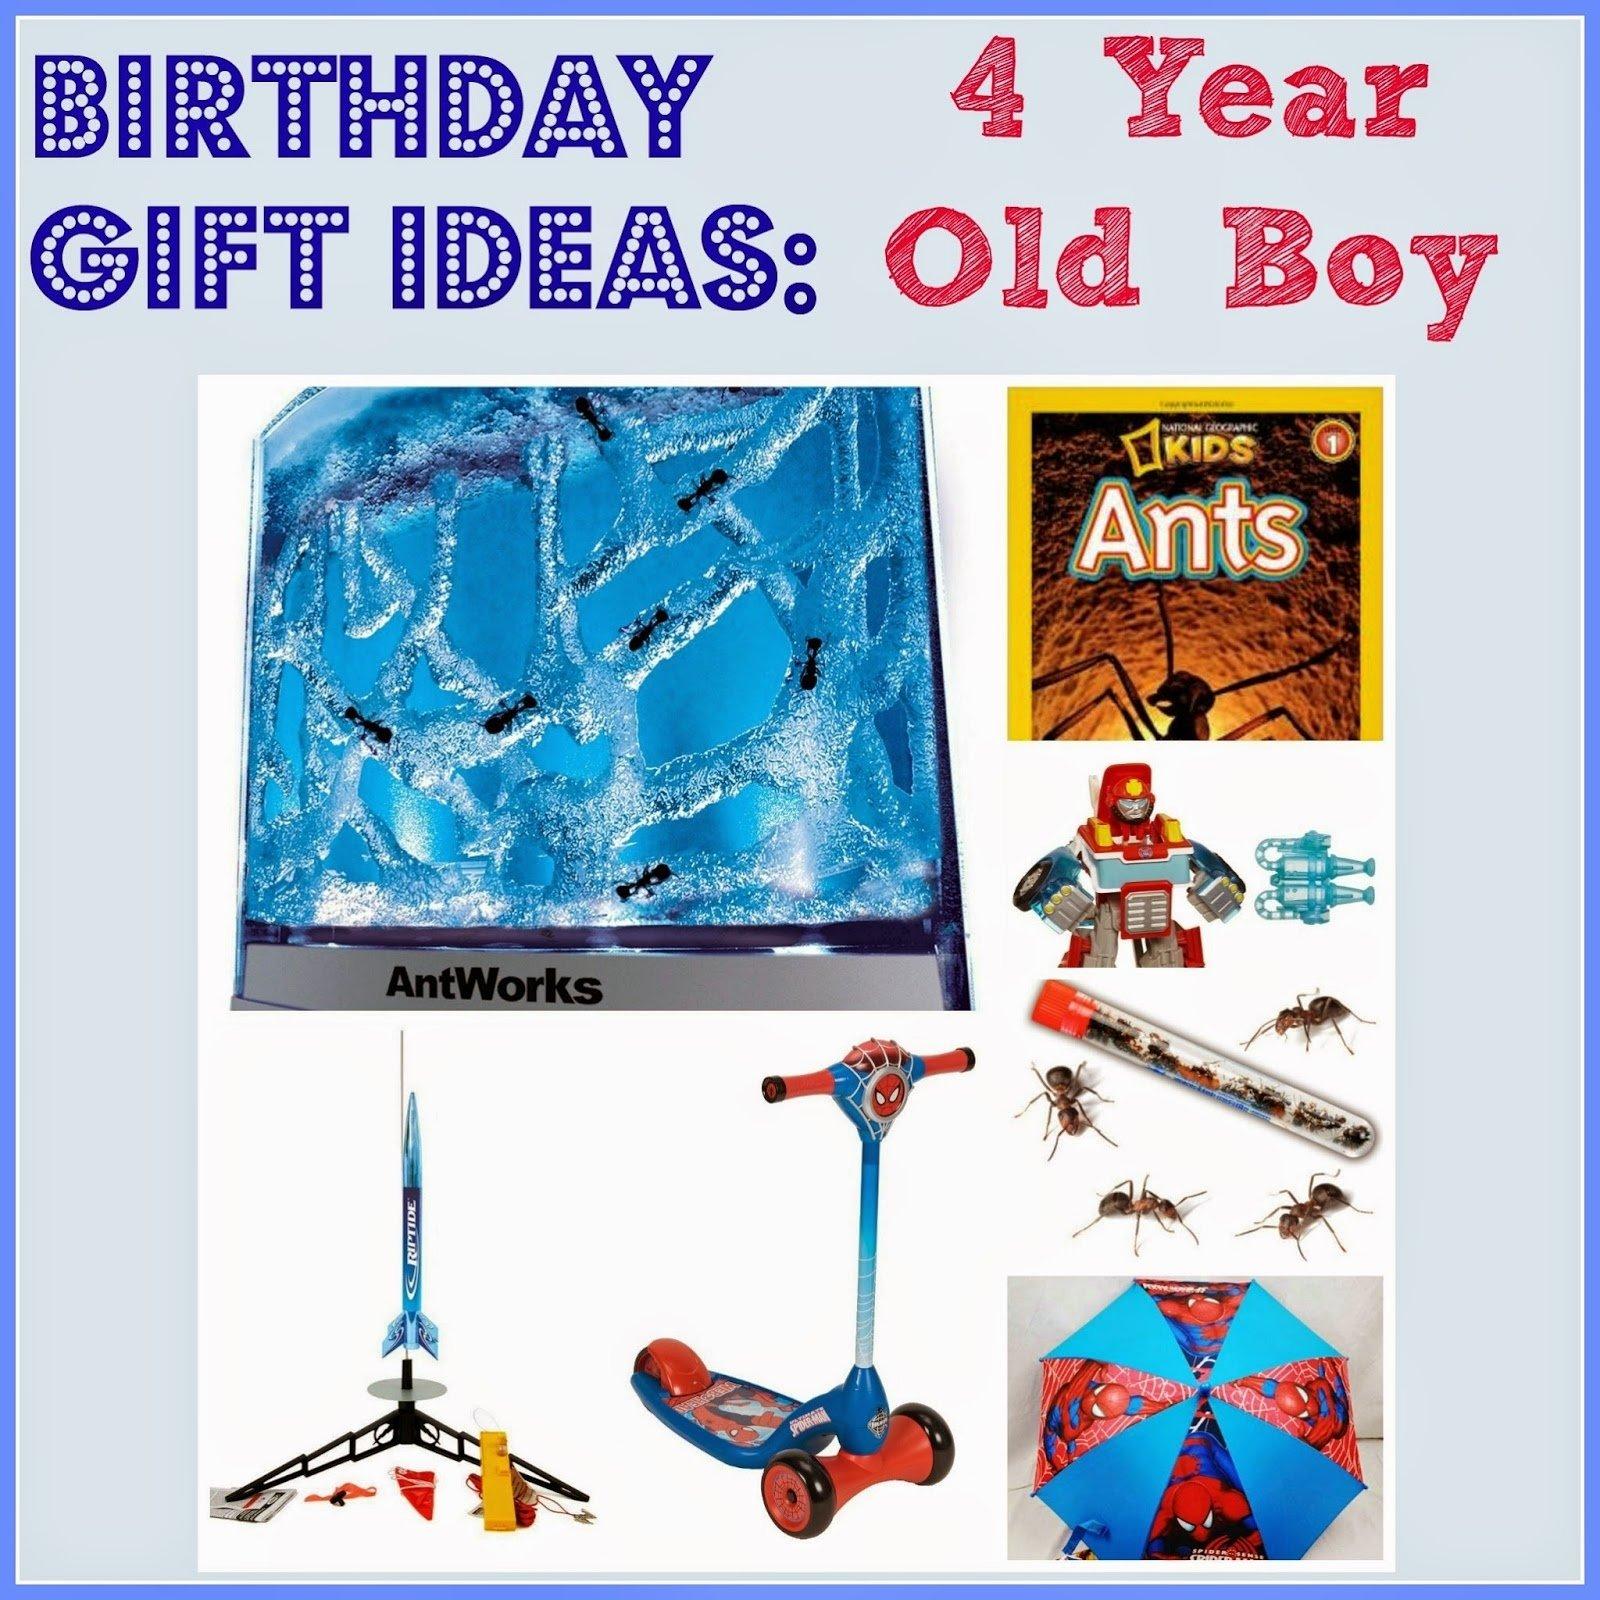 10 Amazing Gift Idea For 4 Year Old Boy year old boy birthday gift ideas home design ideas 9